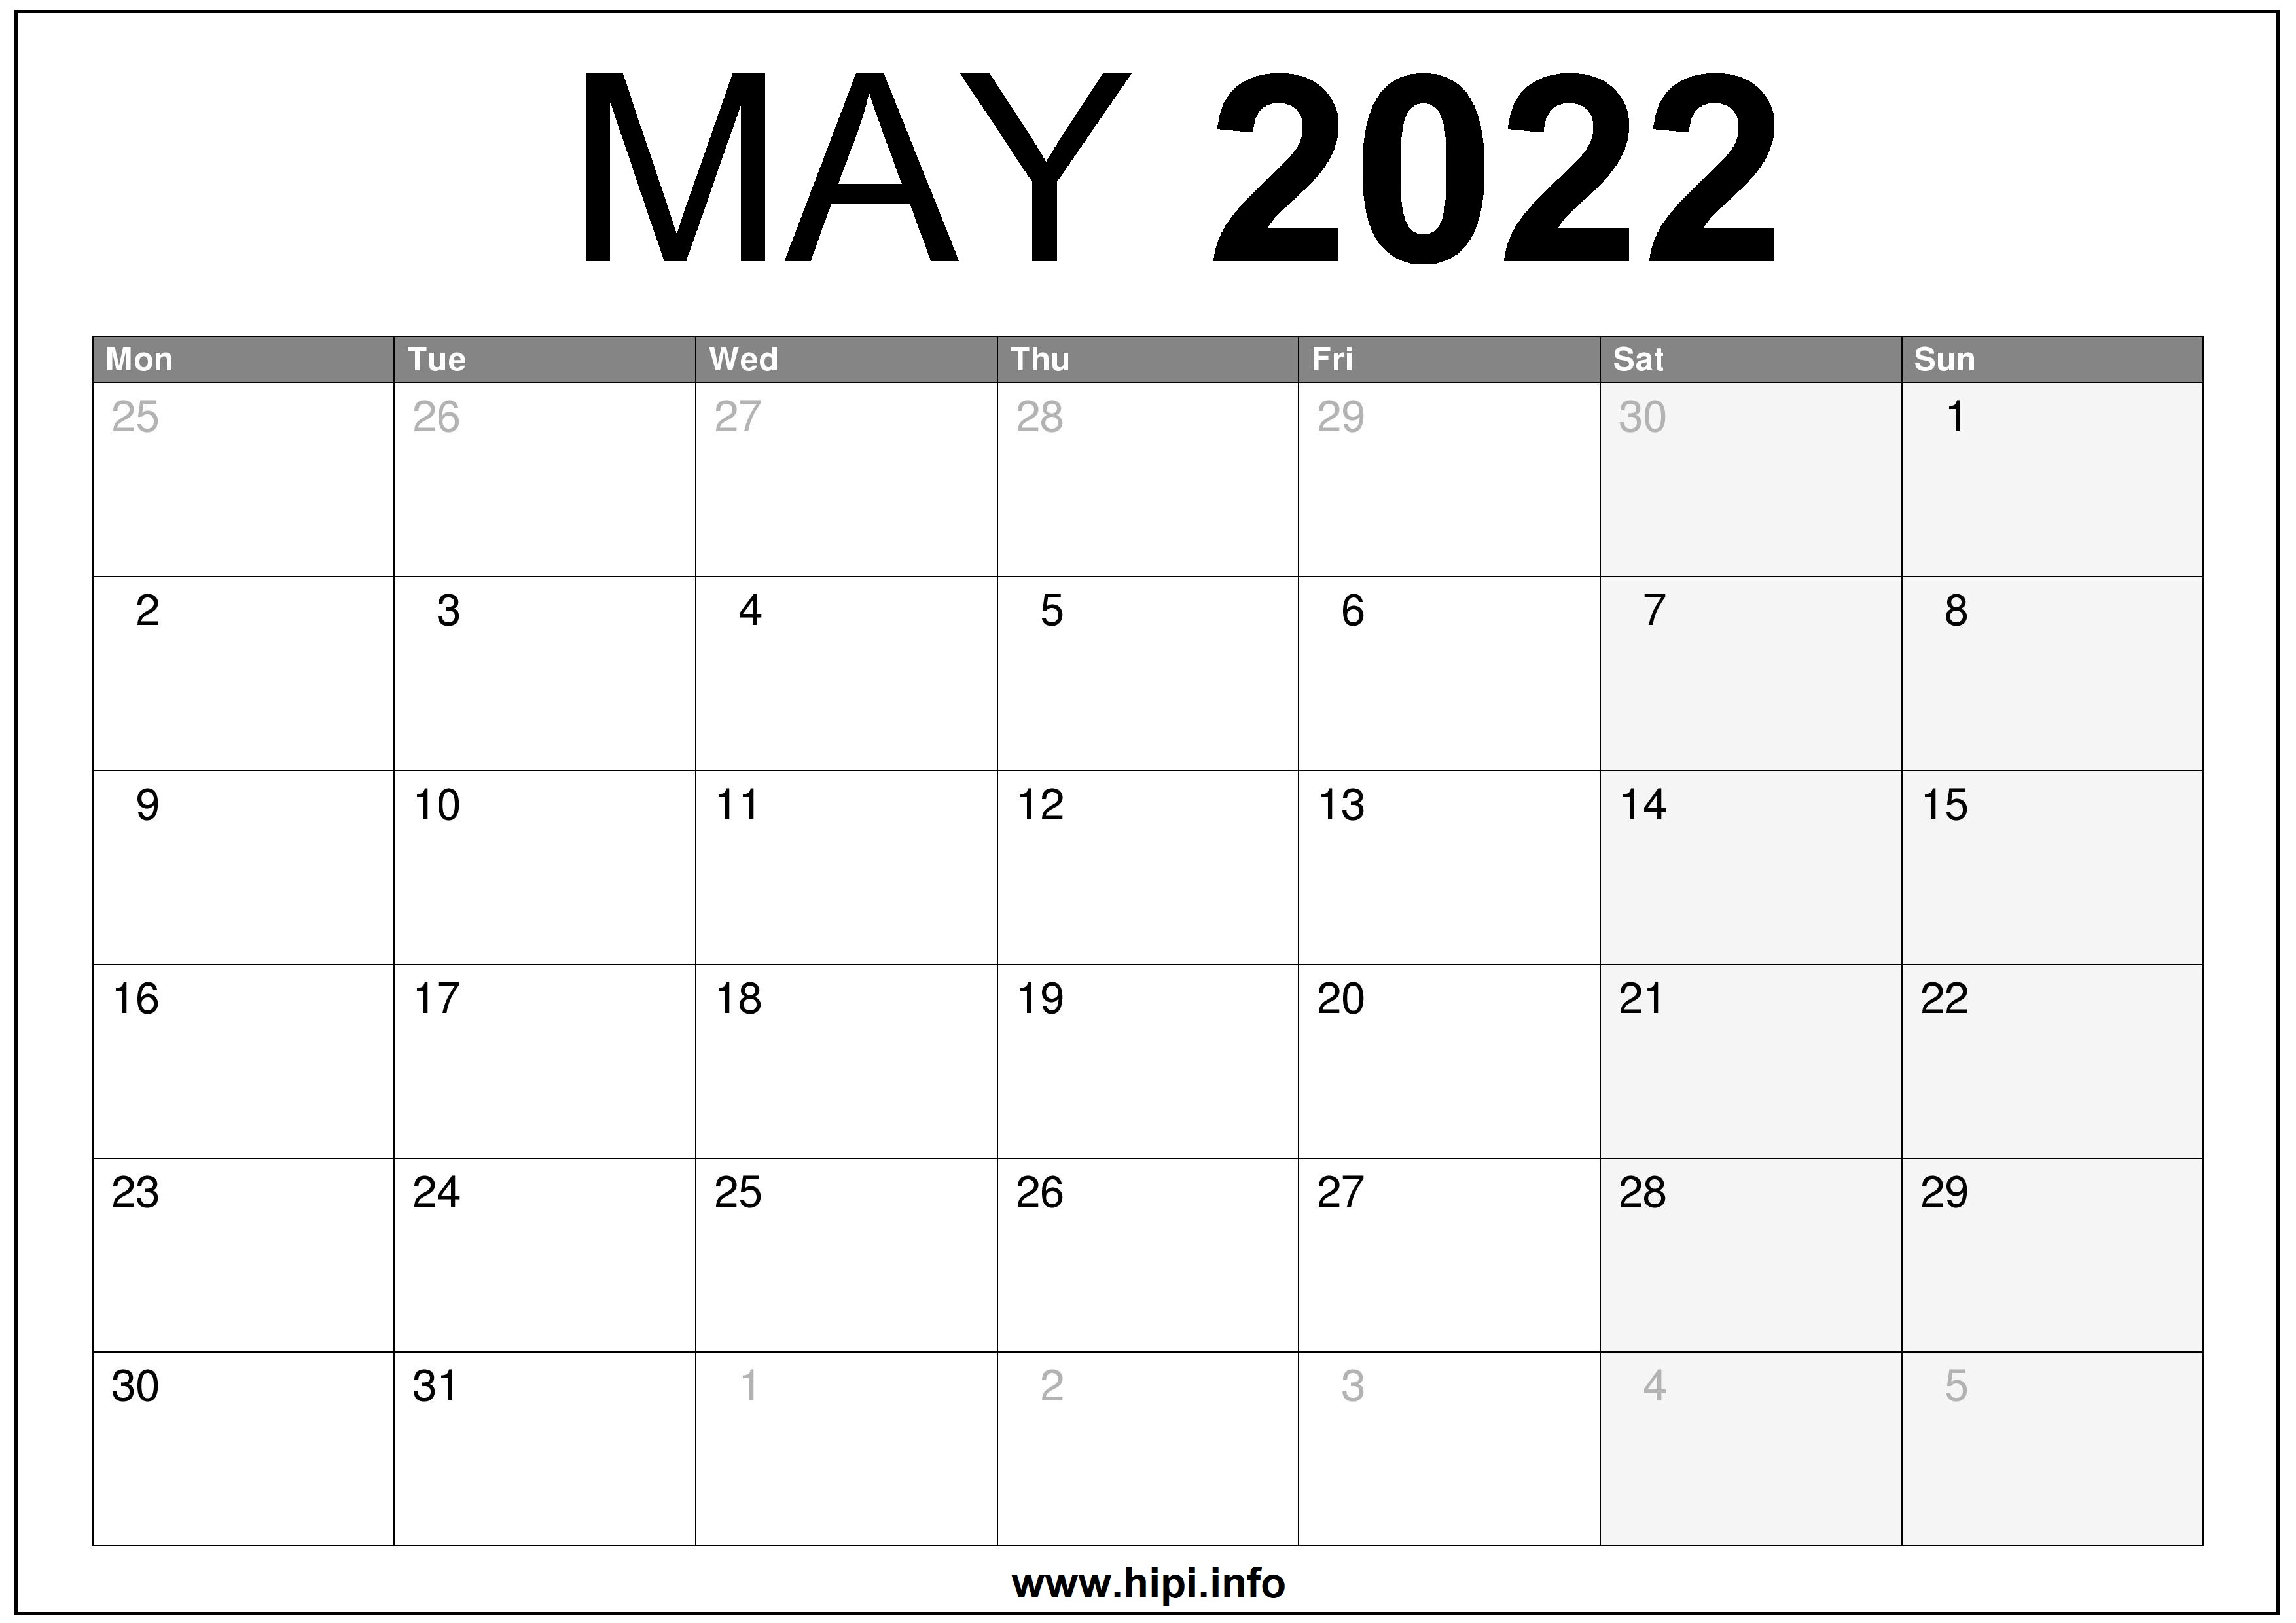 2022 May Calendar Printable.May 2022 Uk Calendar Printable Free Hipi Info Calendars Printable Free